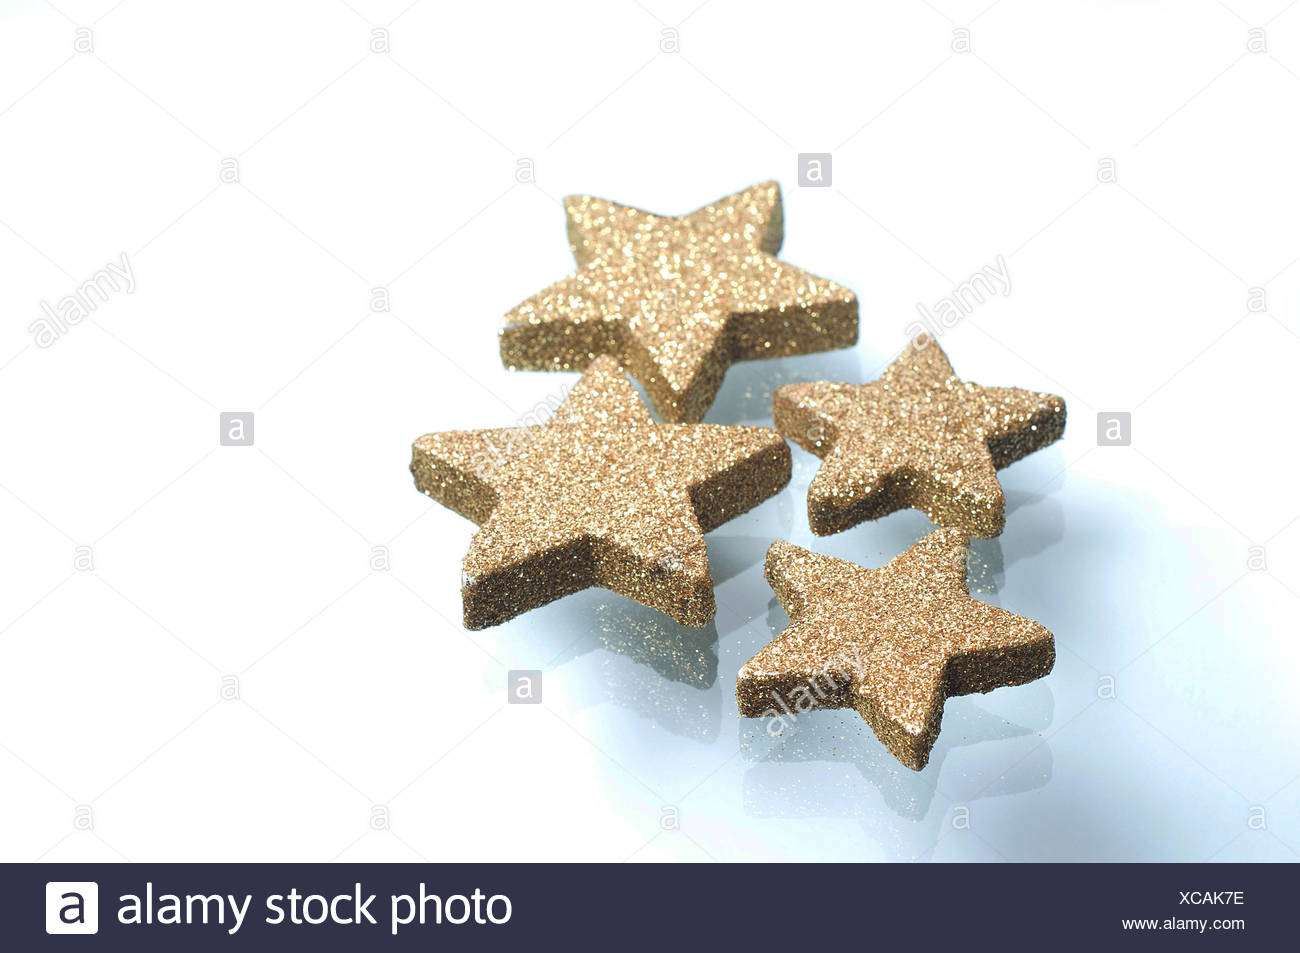 asterisks - Stock Image